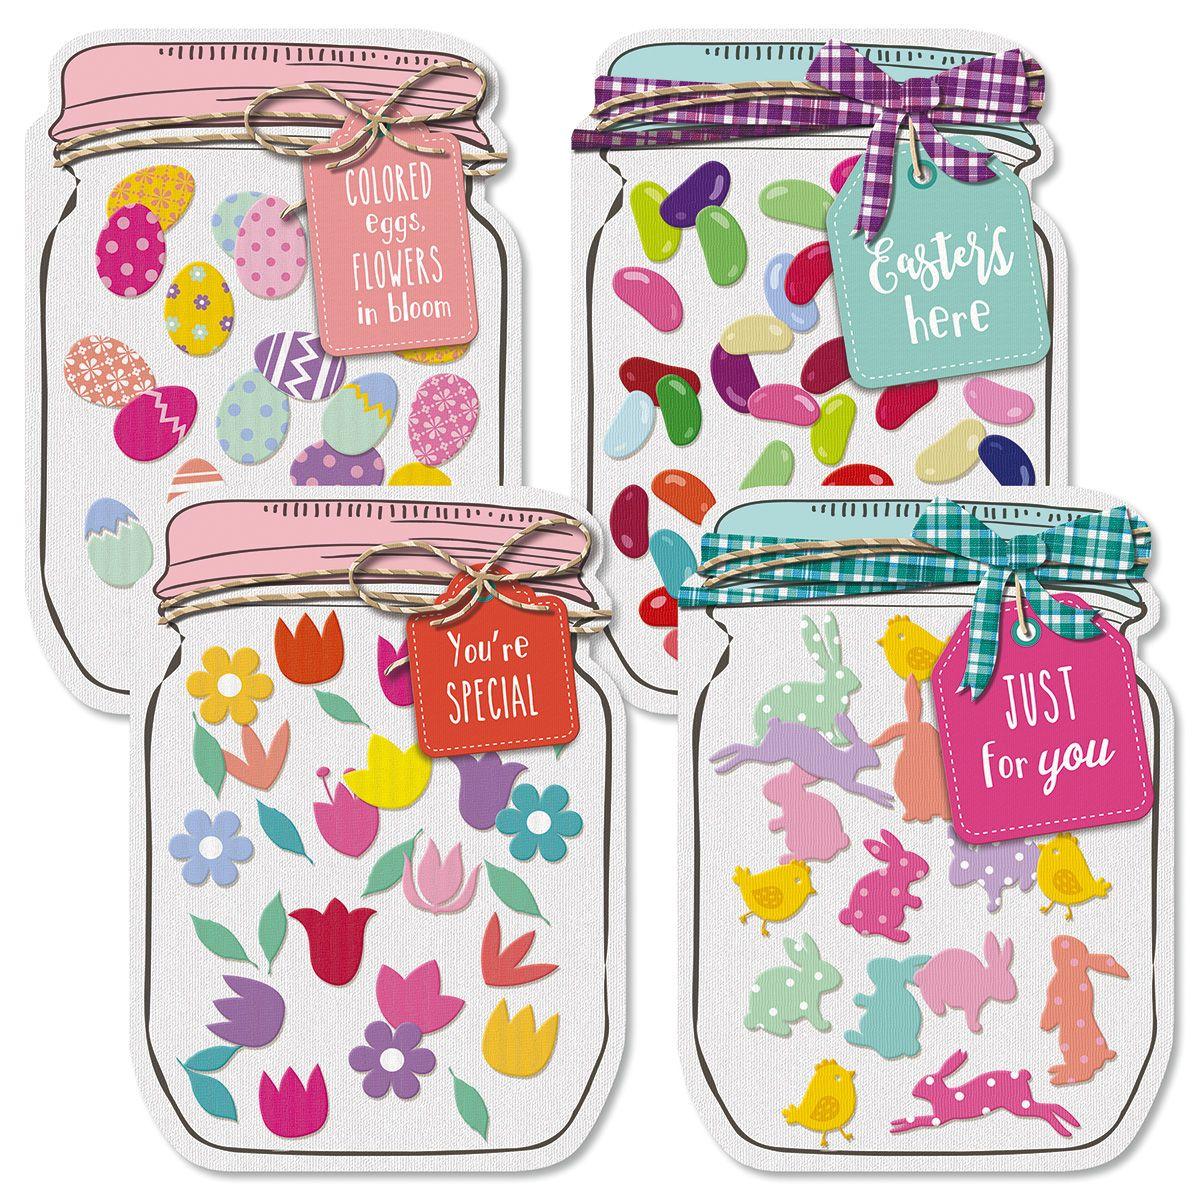 Diecut Jar Easter Cards